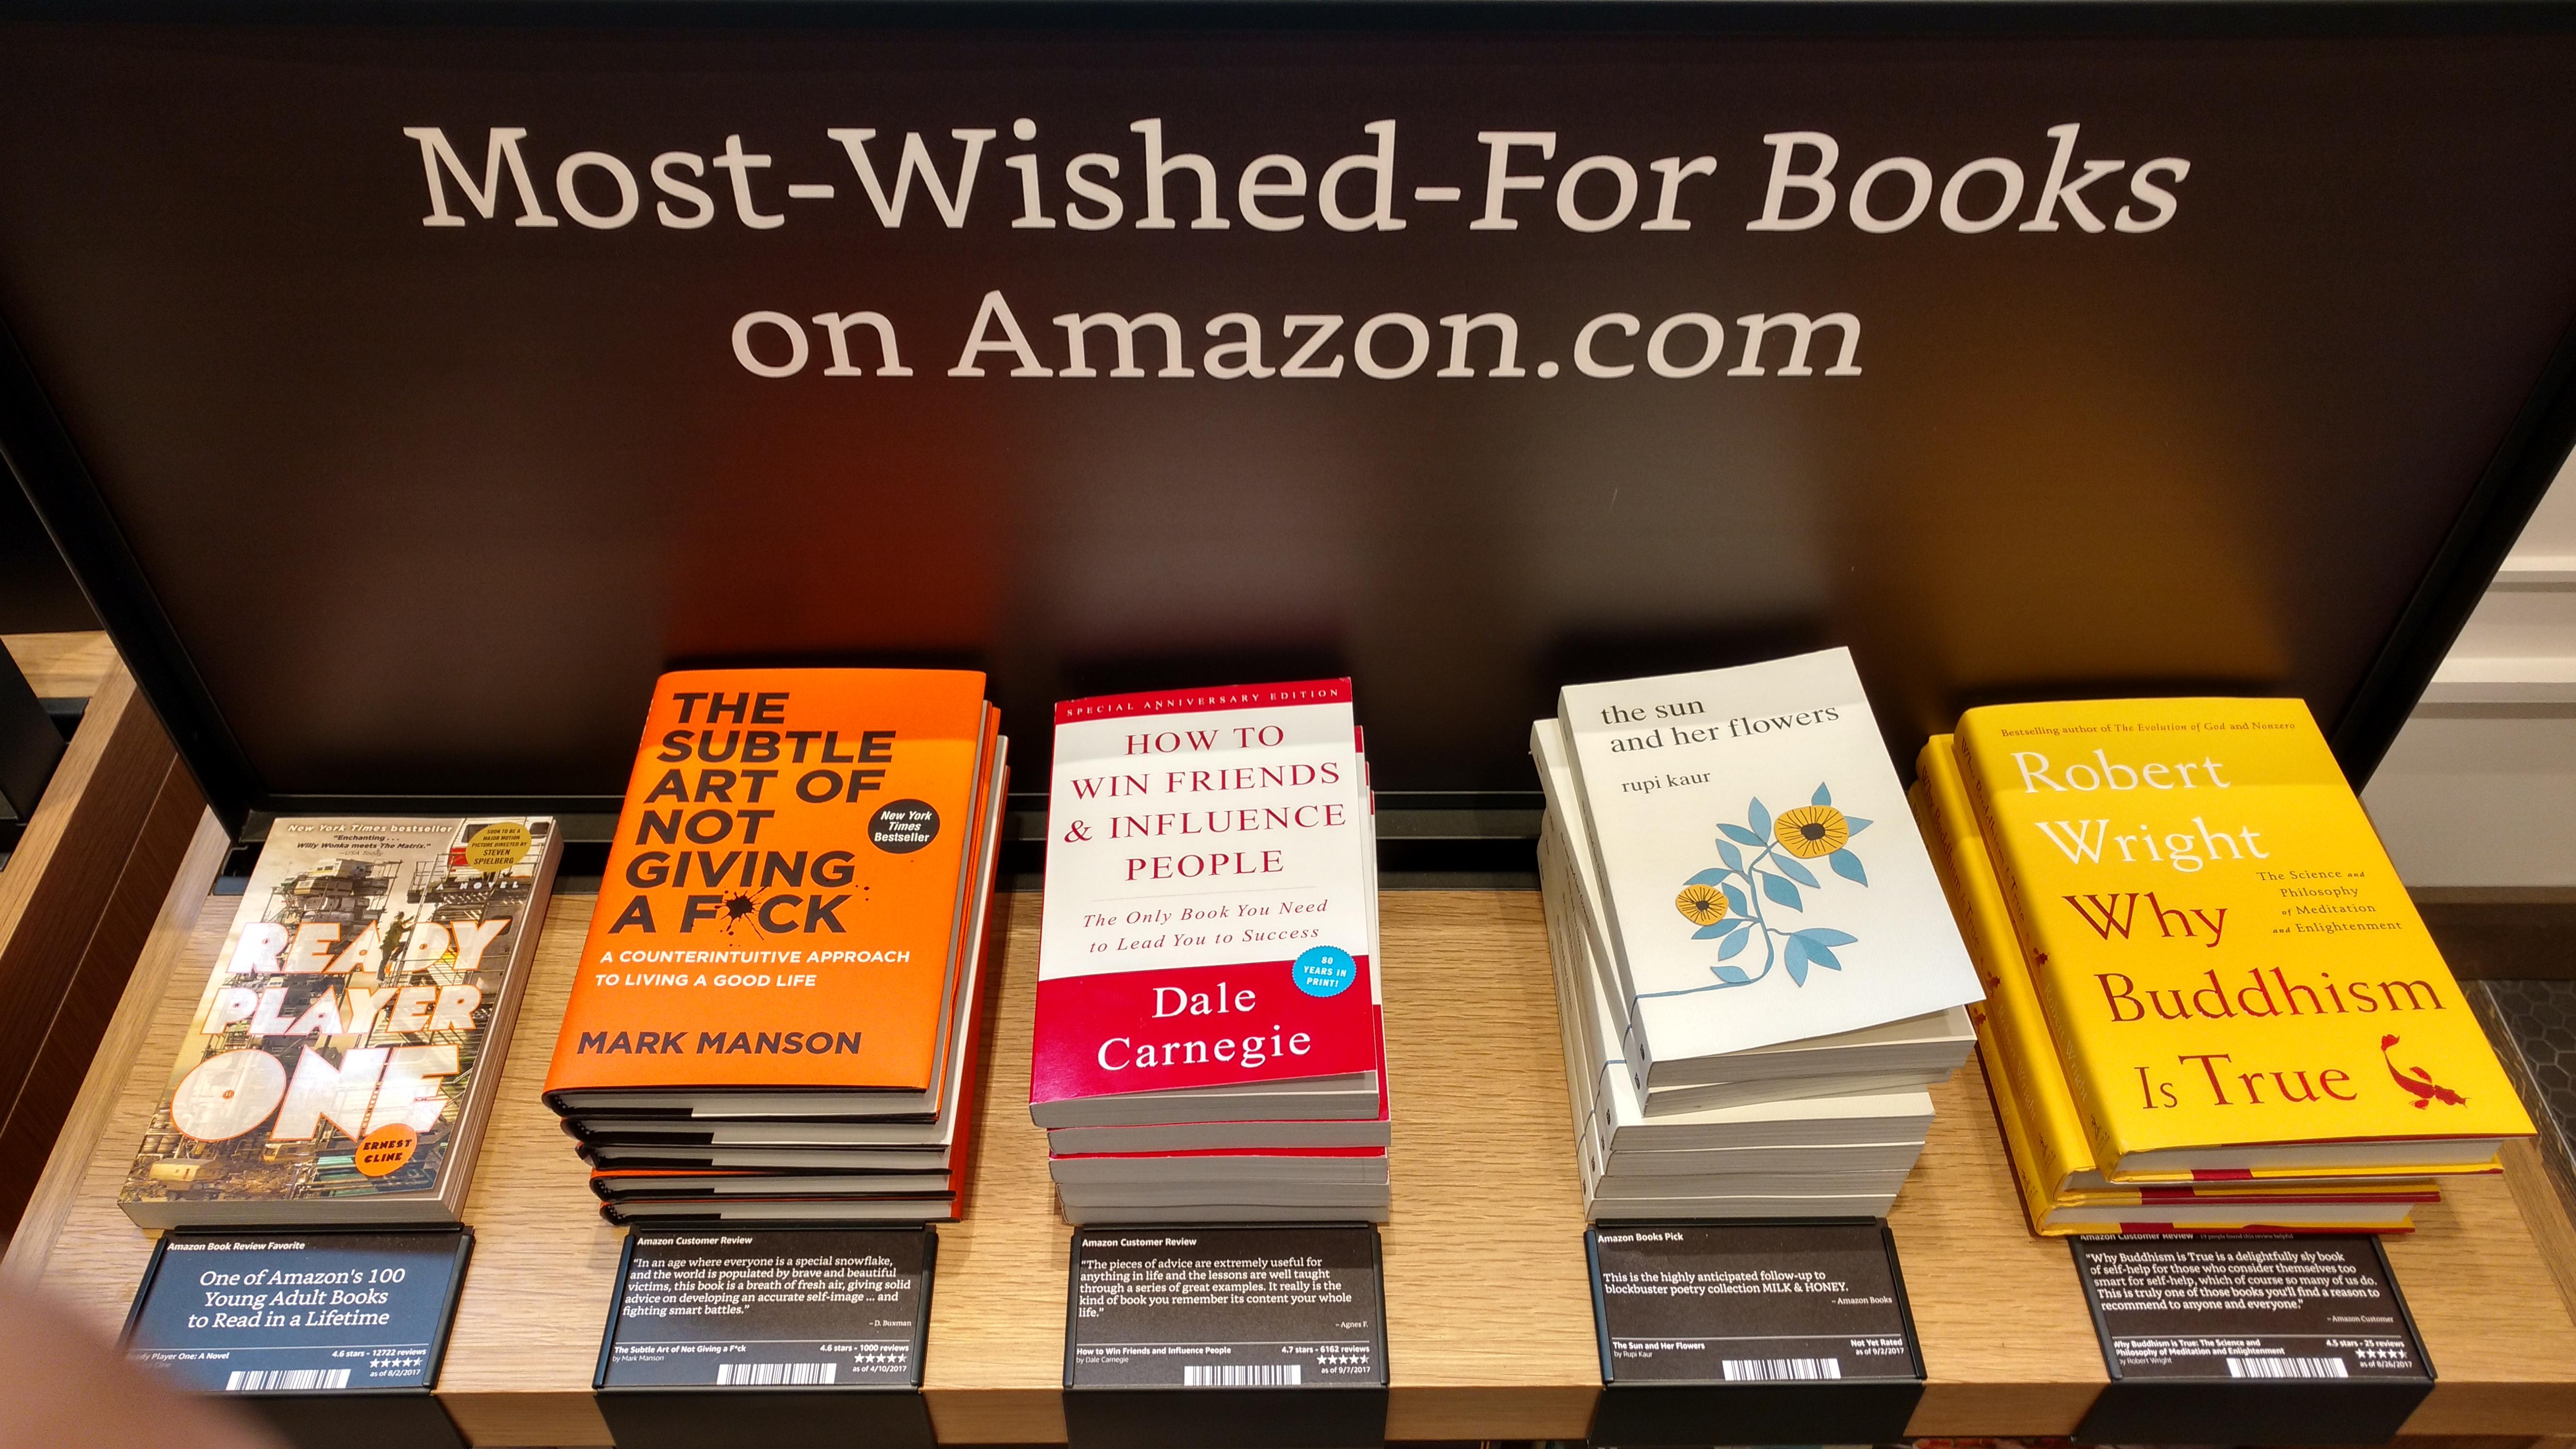 Librairie Amazon plus recherchés